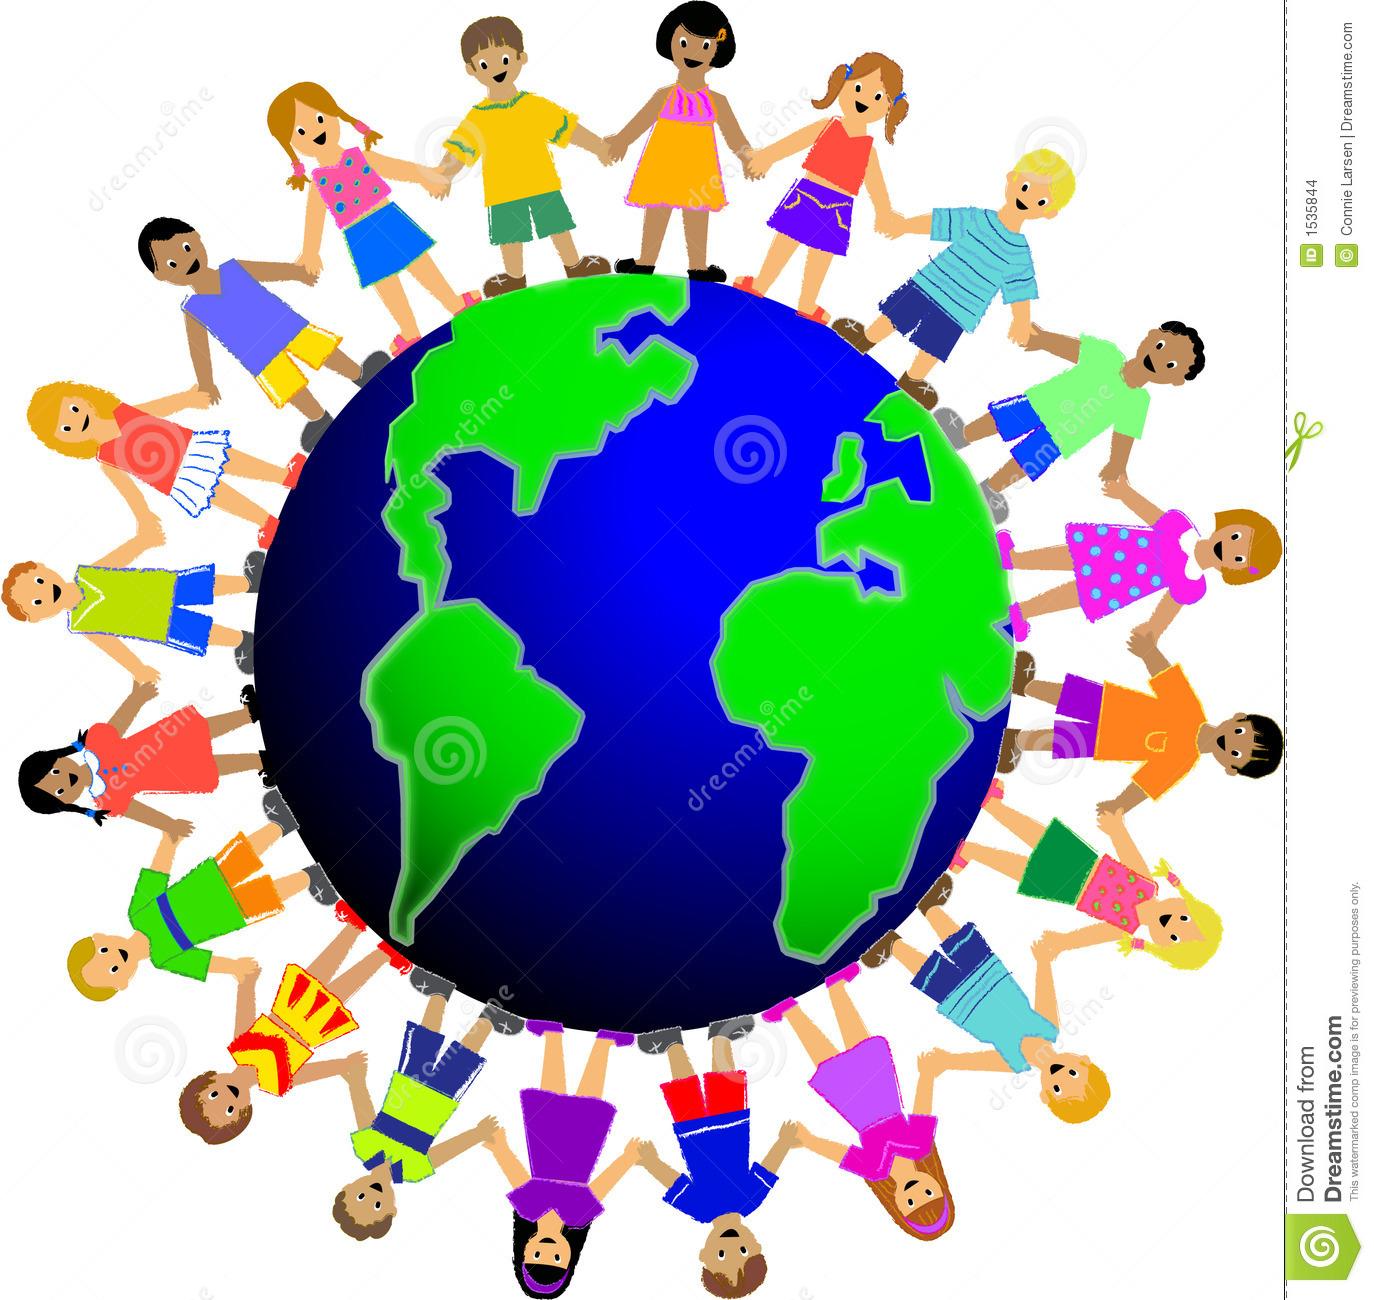 1374x1300 Clip Art Of Children Around The World Holding A Shoe Box